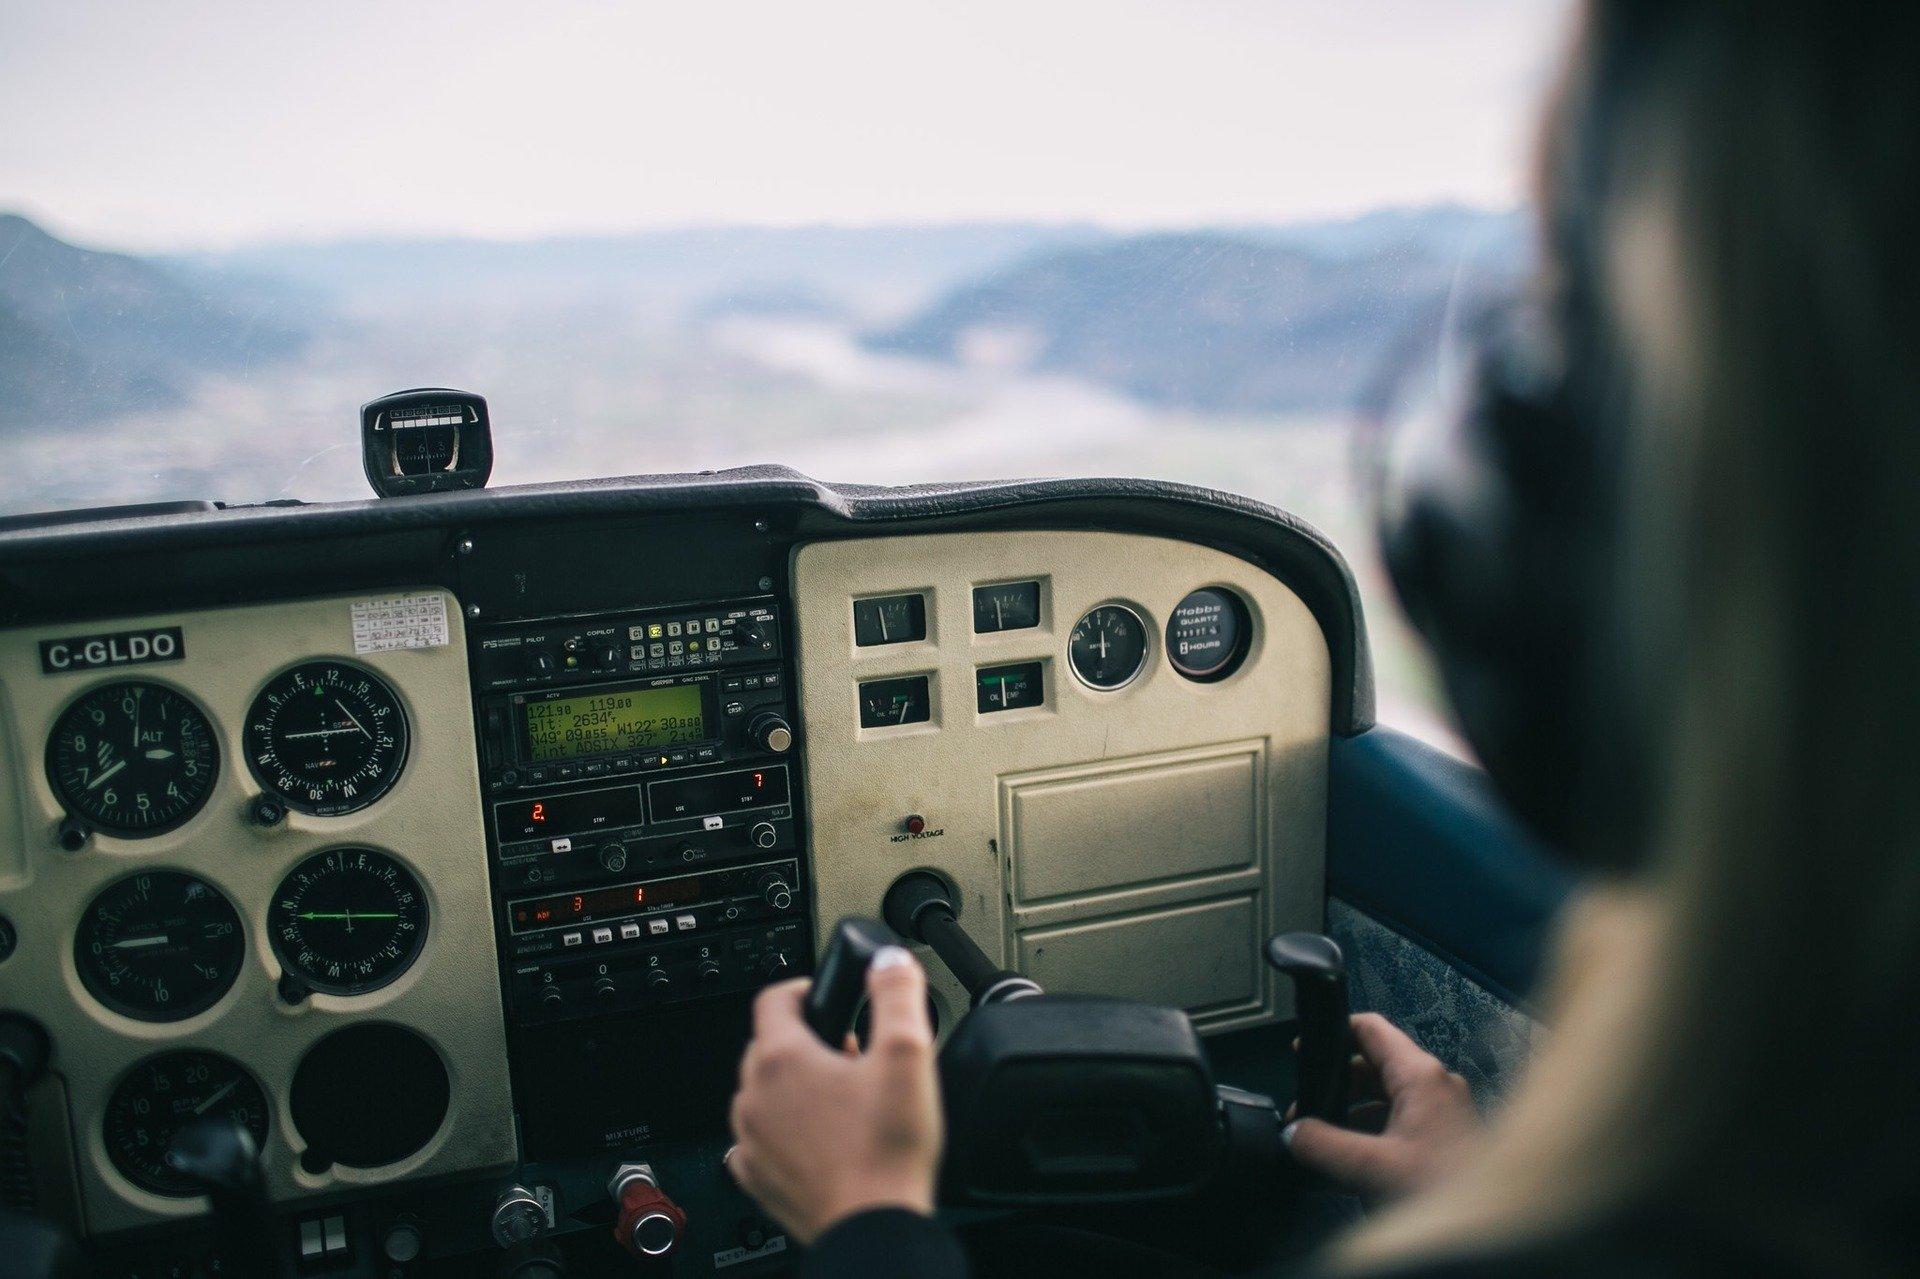 Reasons_To_Run_a_Pilot_Course